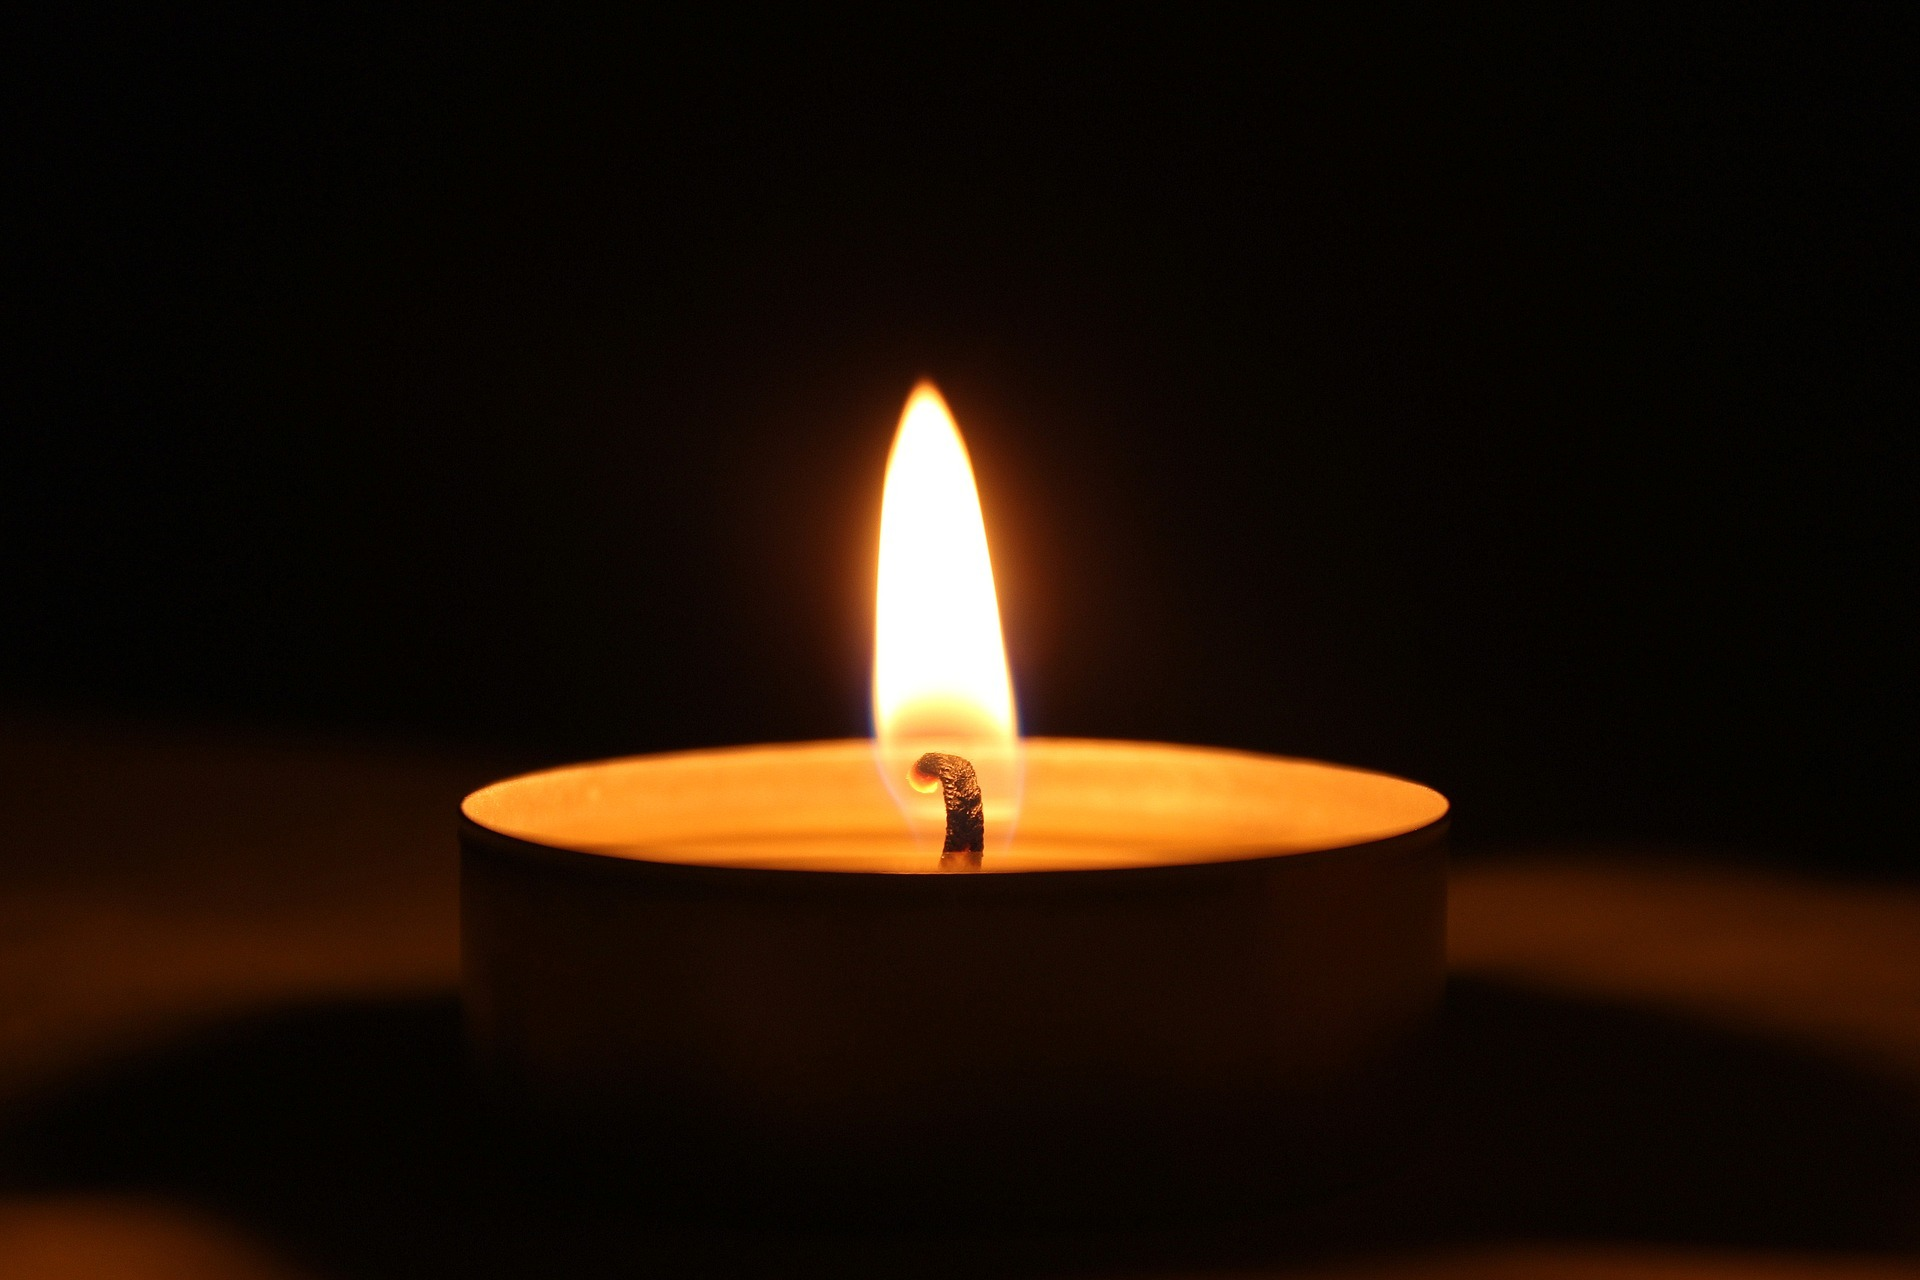 candle-3056195_1920.jpg